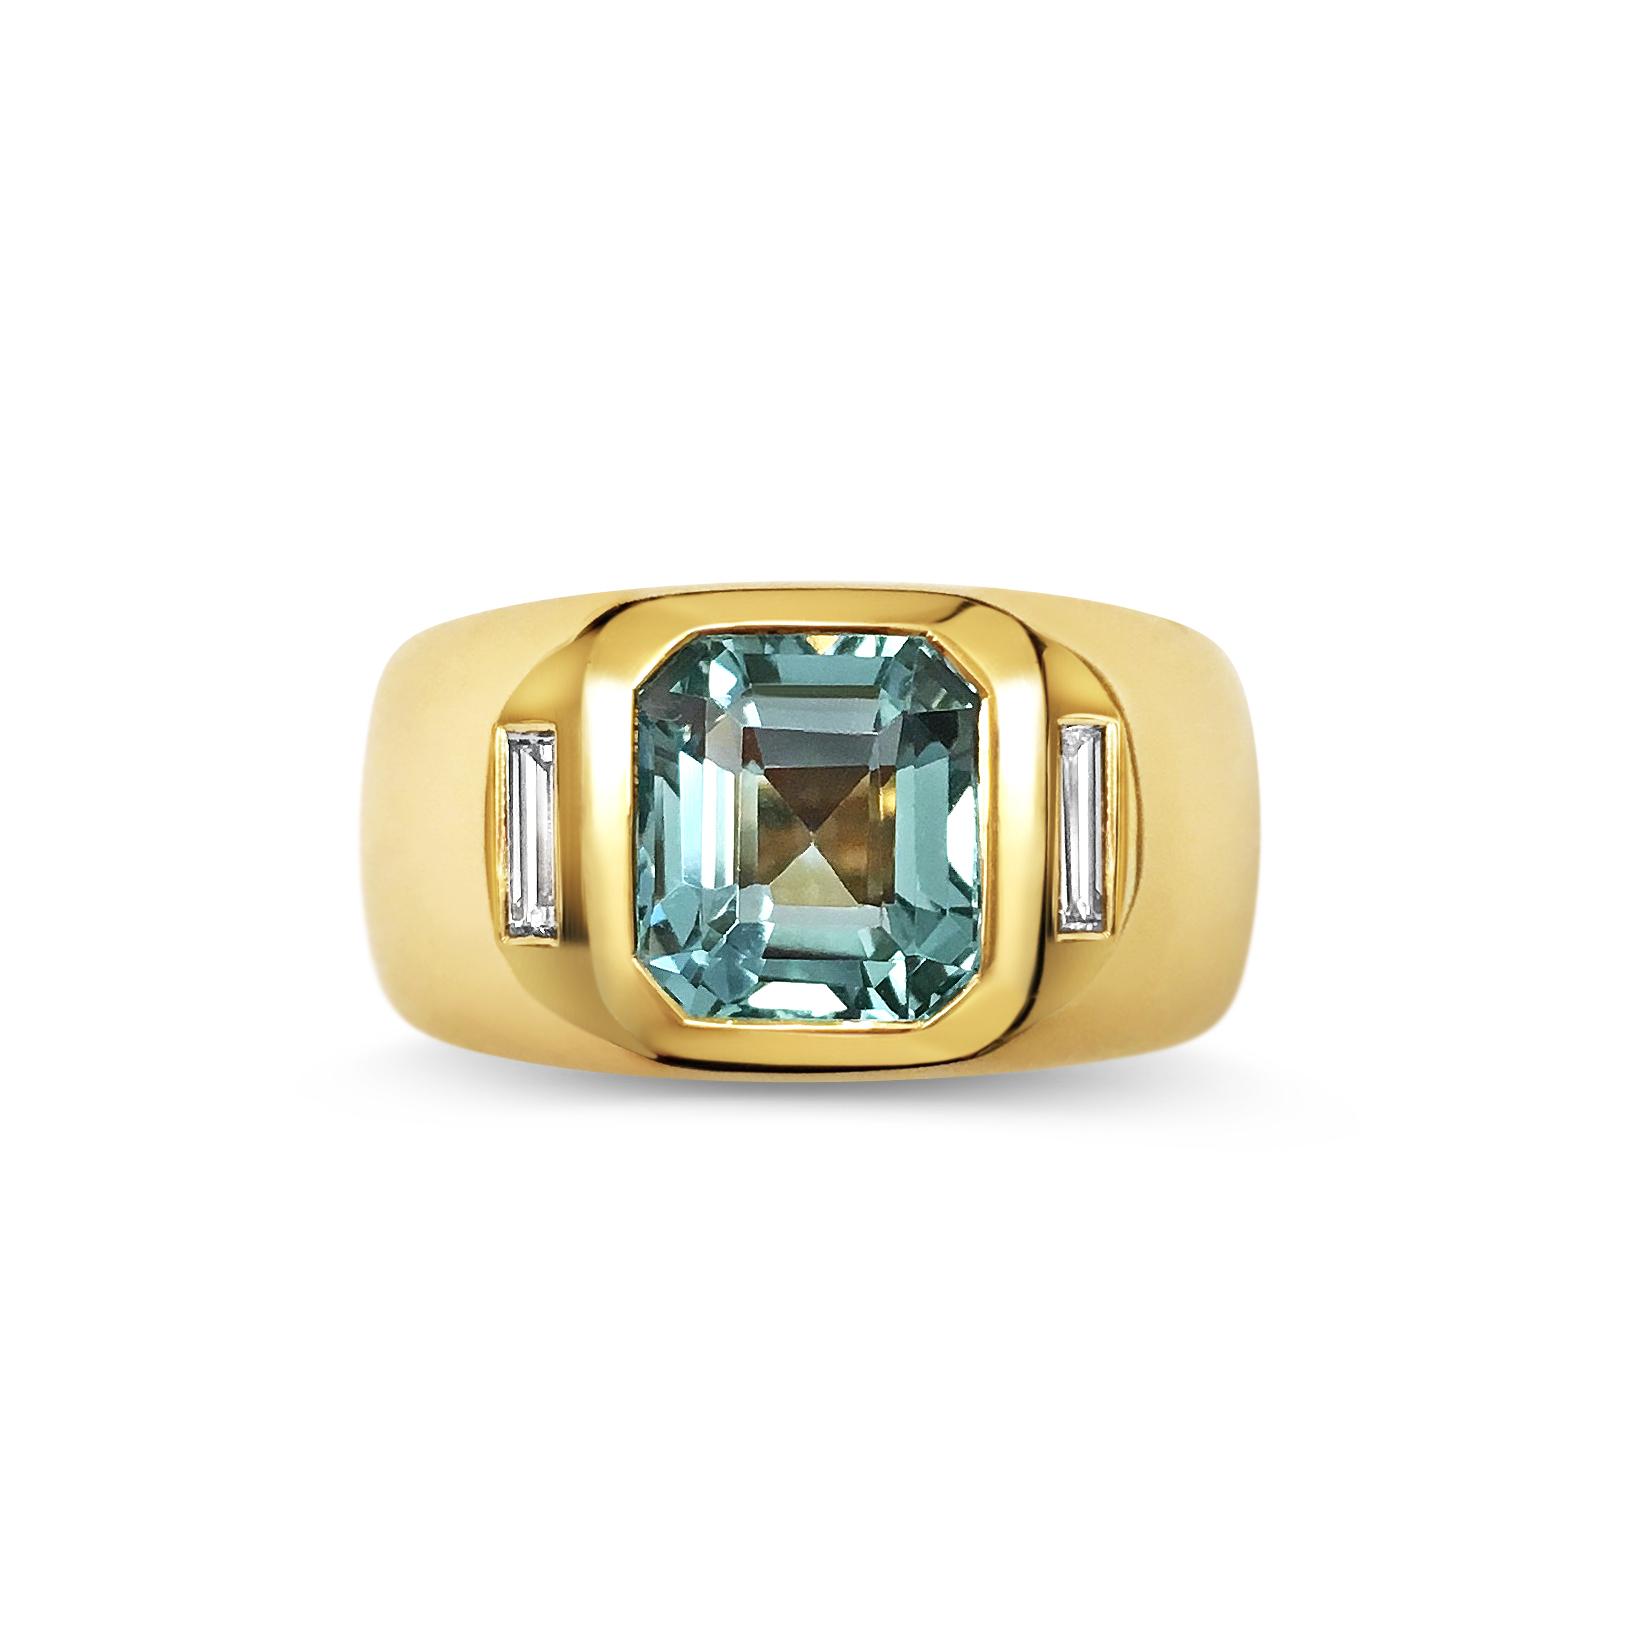 Aquamarine and diamond ring top view